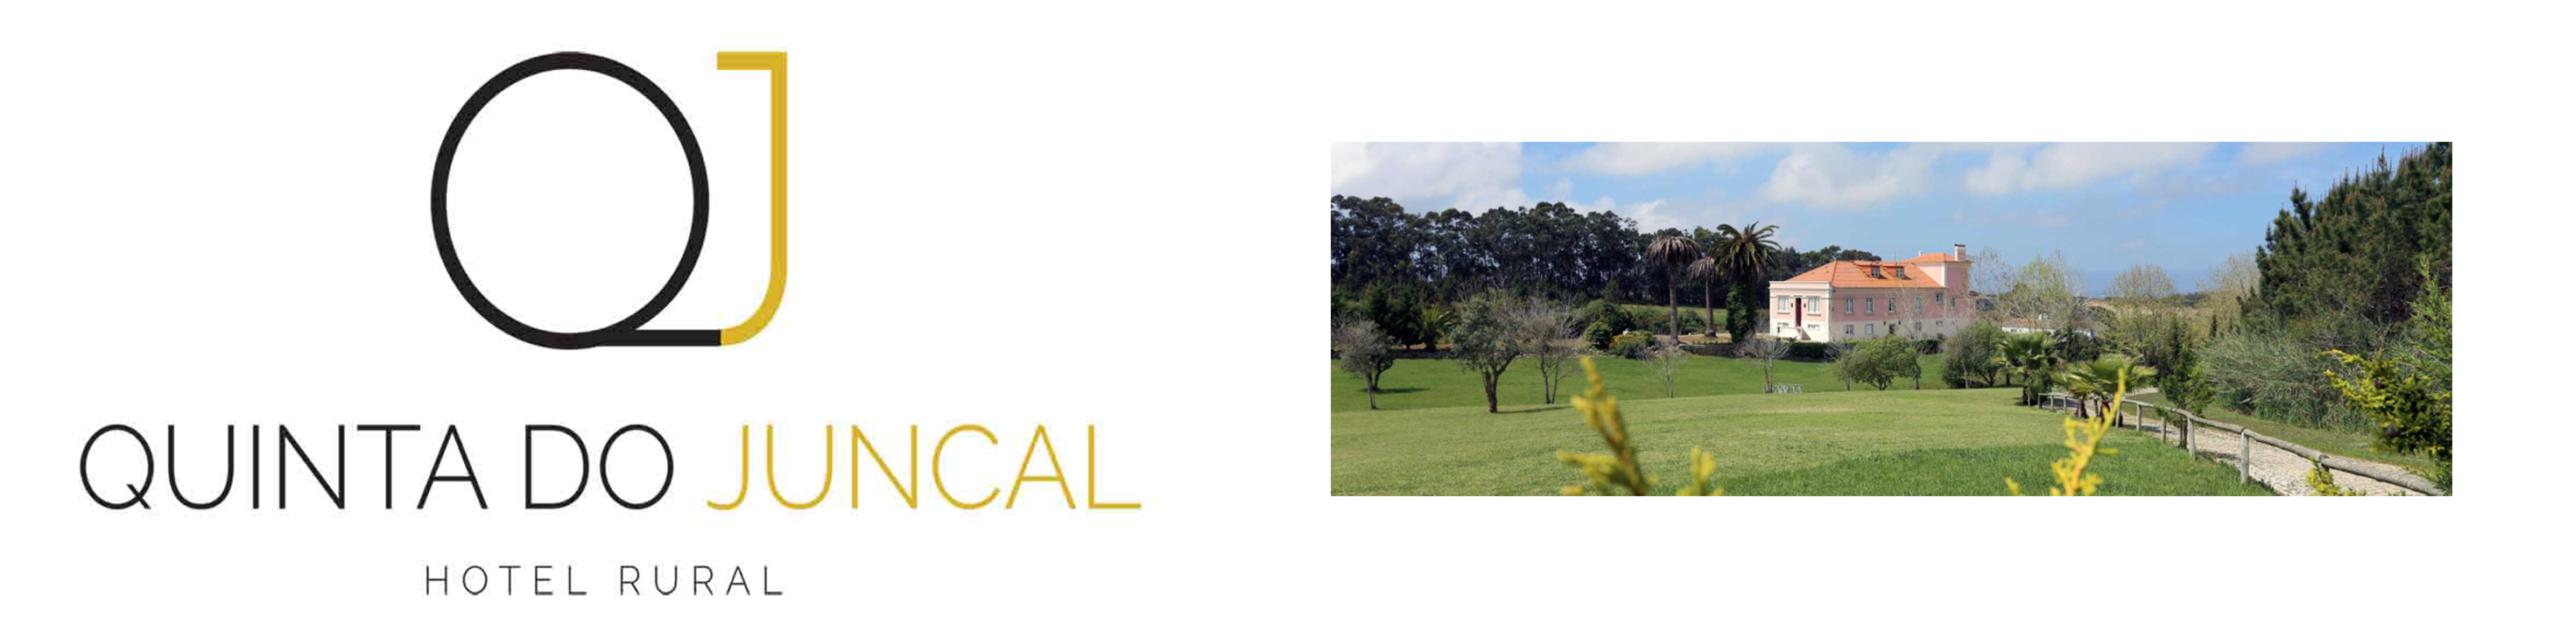 Quinta do Juncal